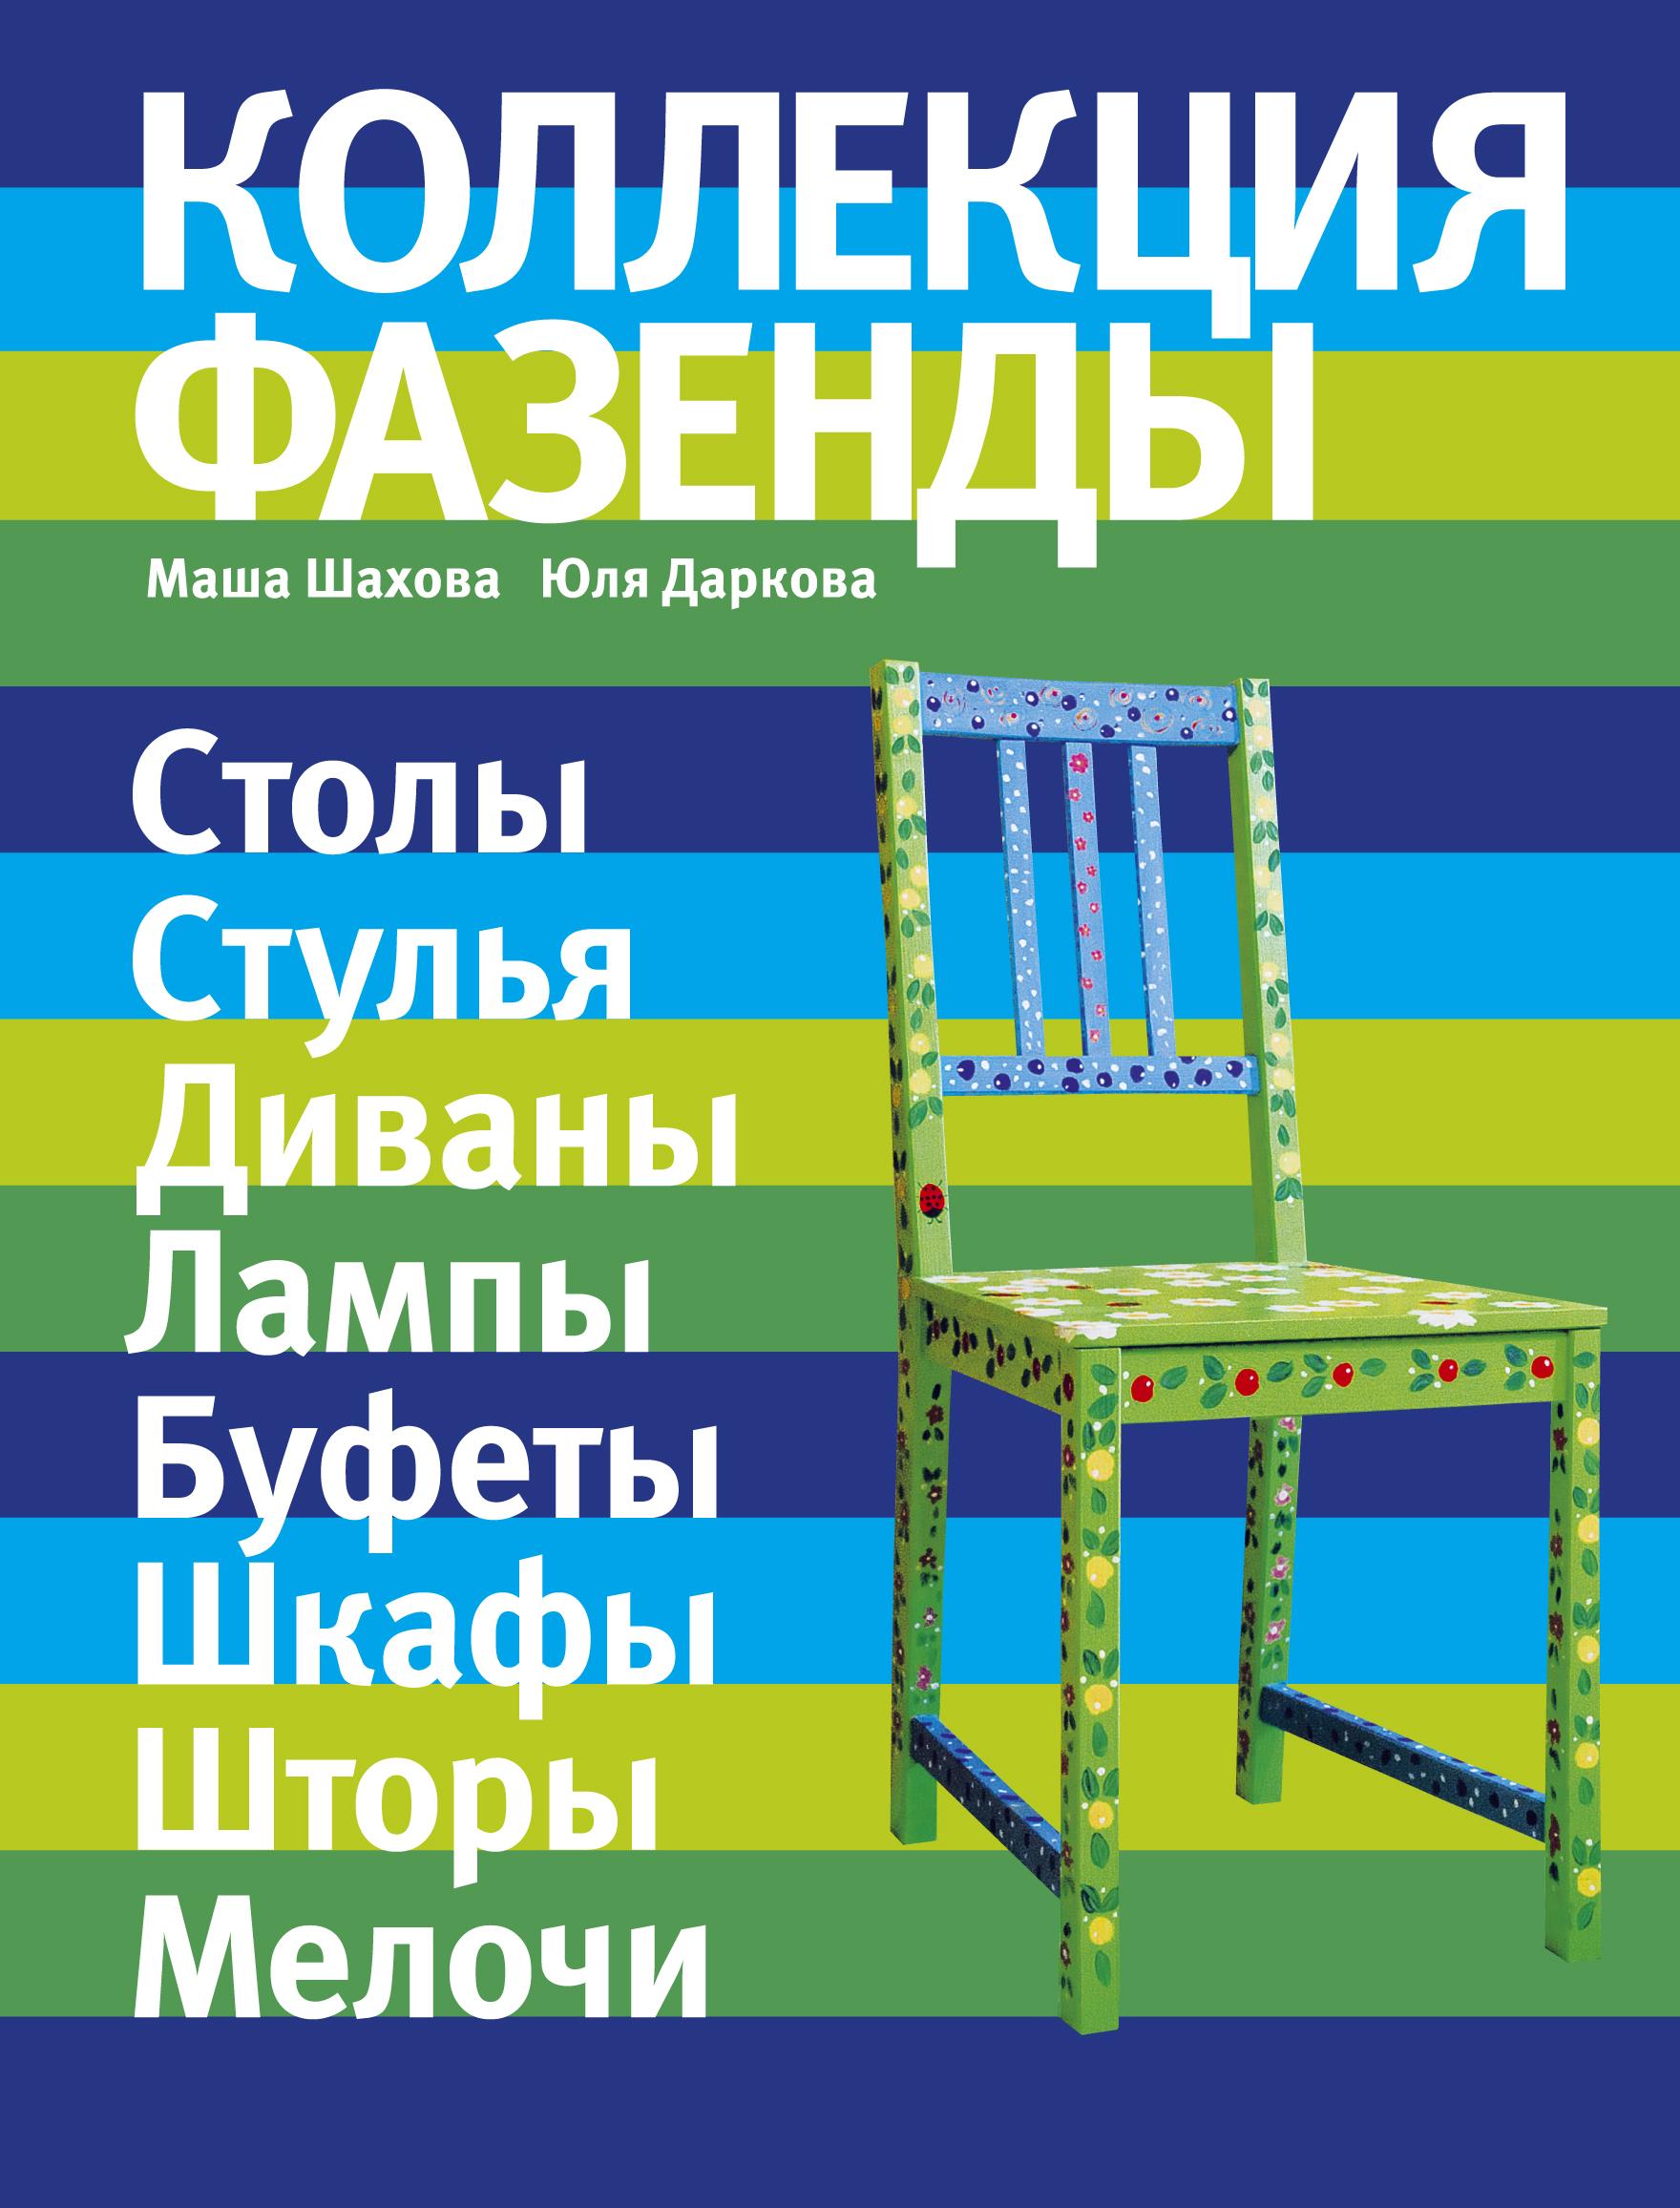 Шахова М., Даркова Ю. Коллекция Фазенды